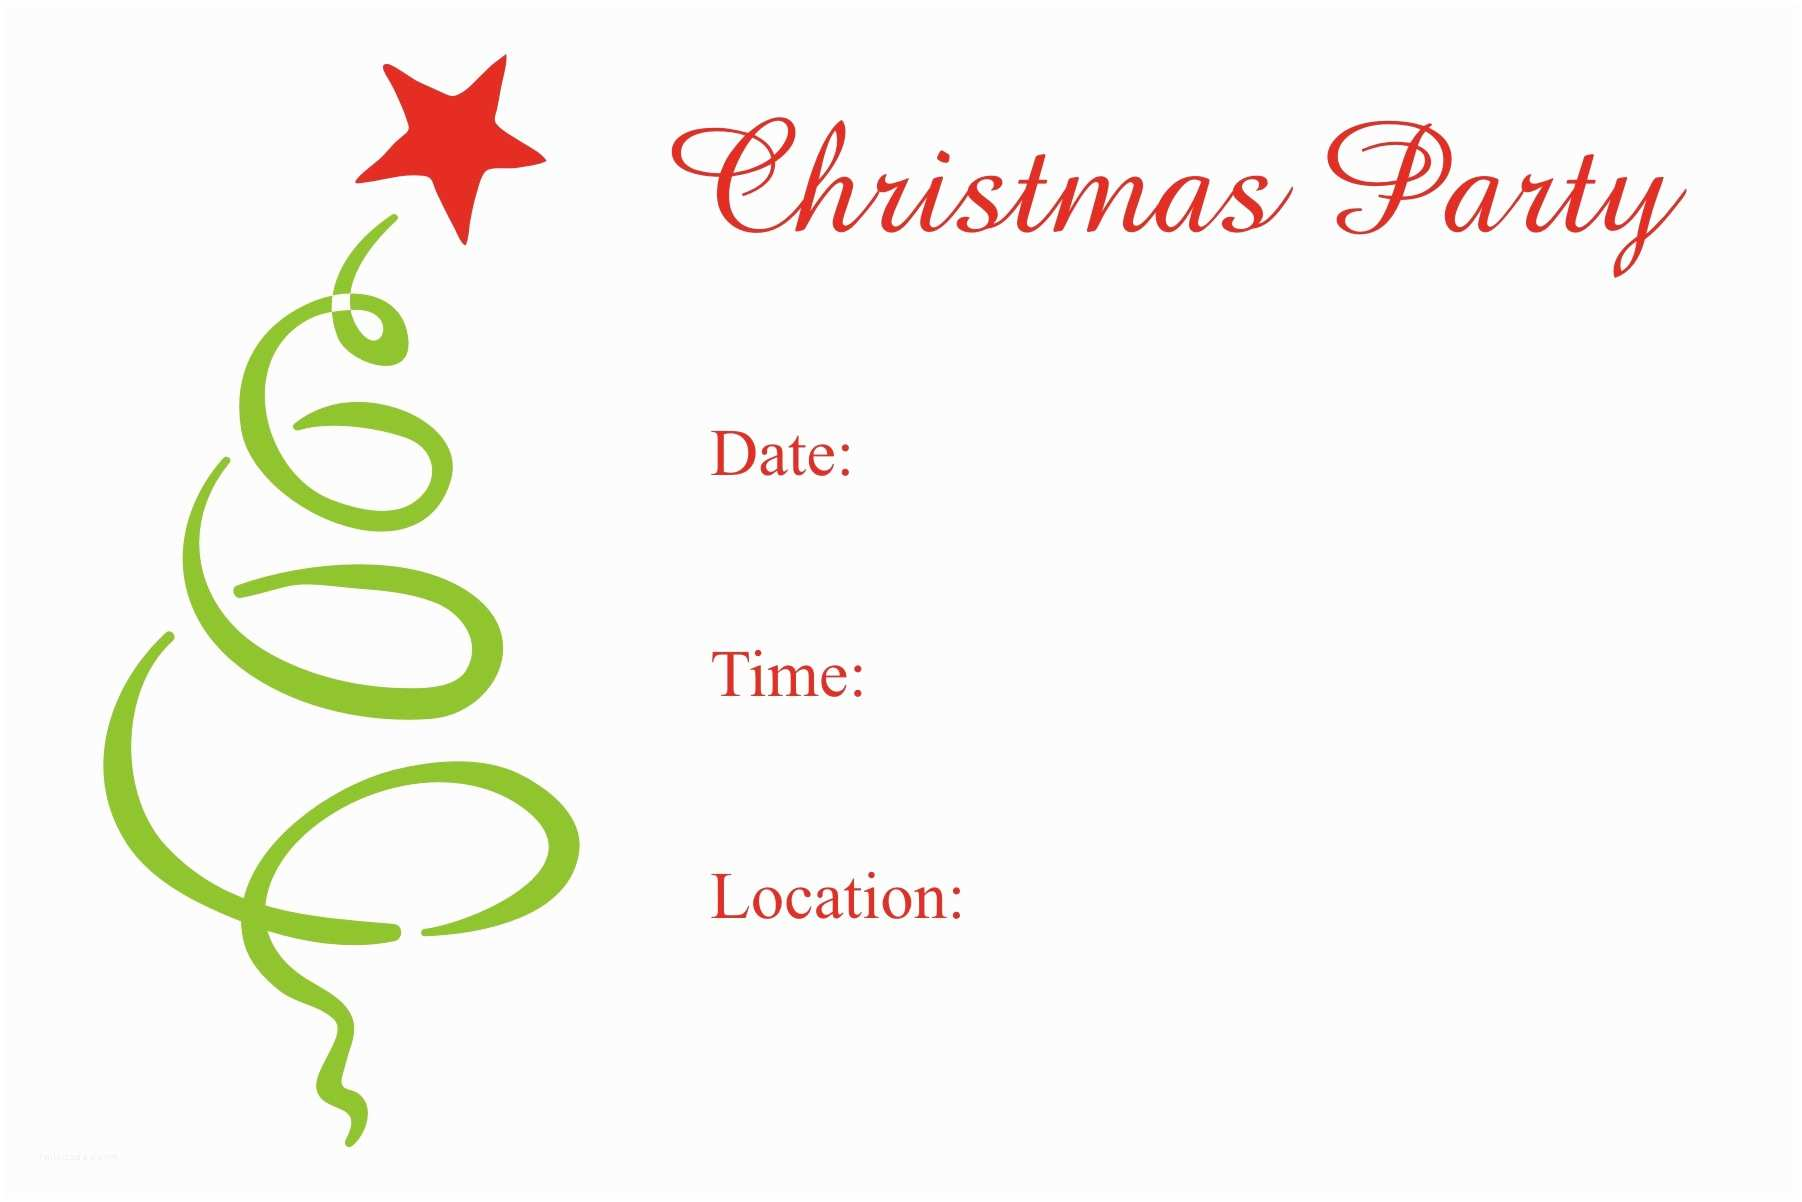 Free Holiday Party Invitation Templates Free Printable Christmas Party Invitations Templates